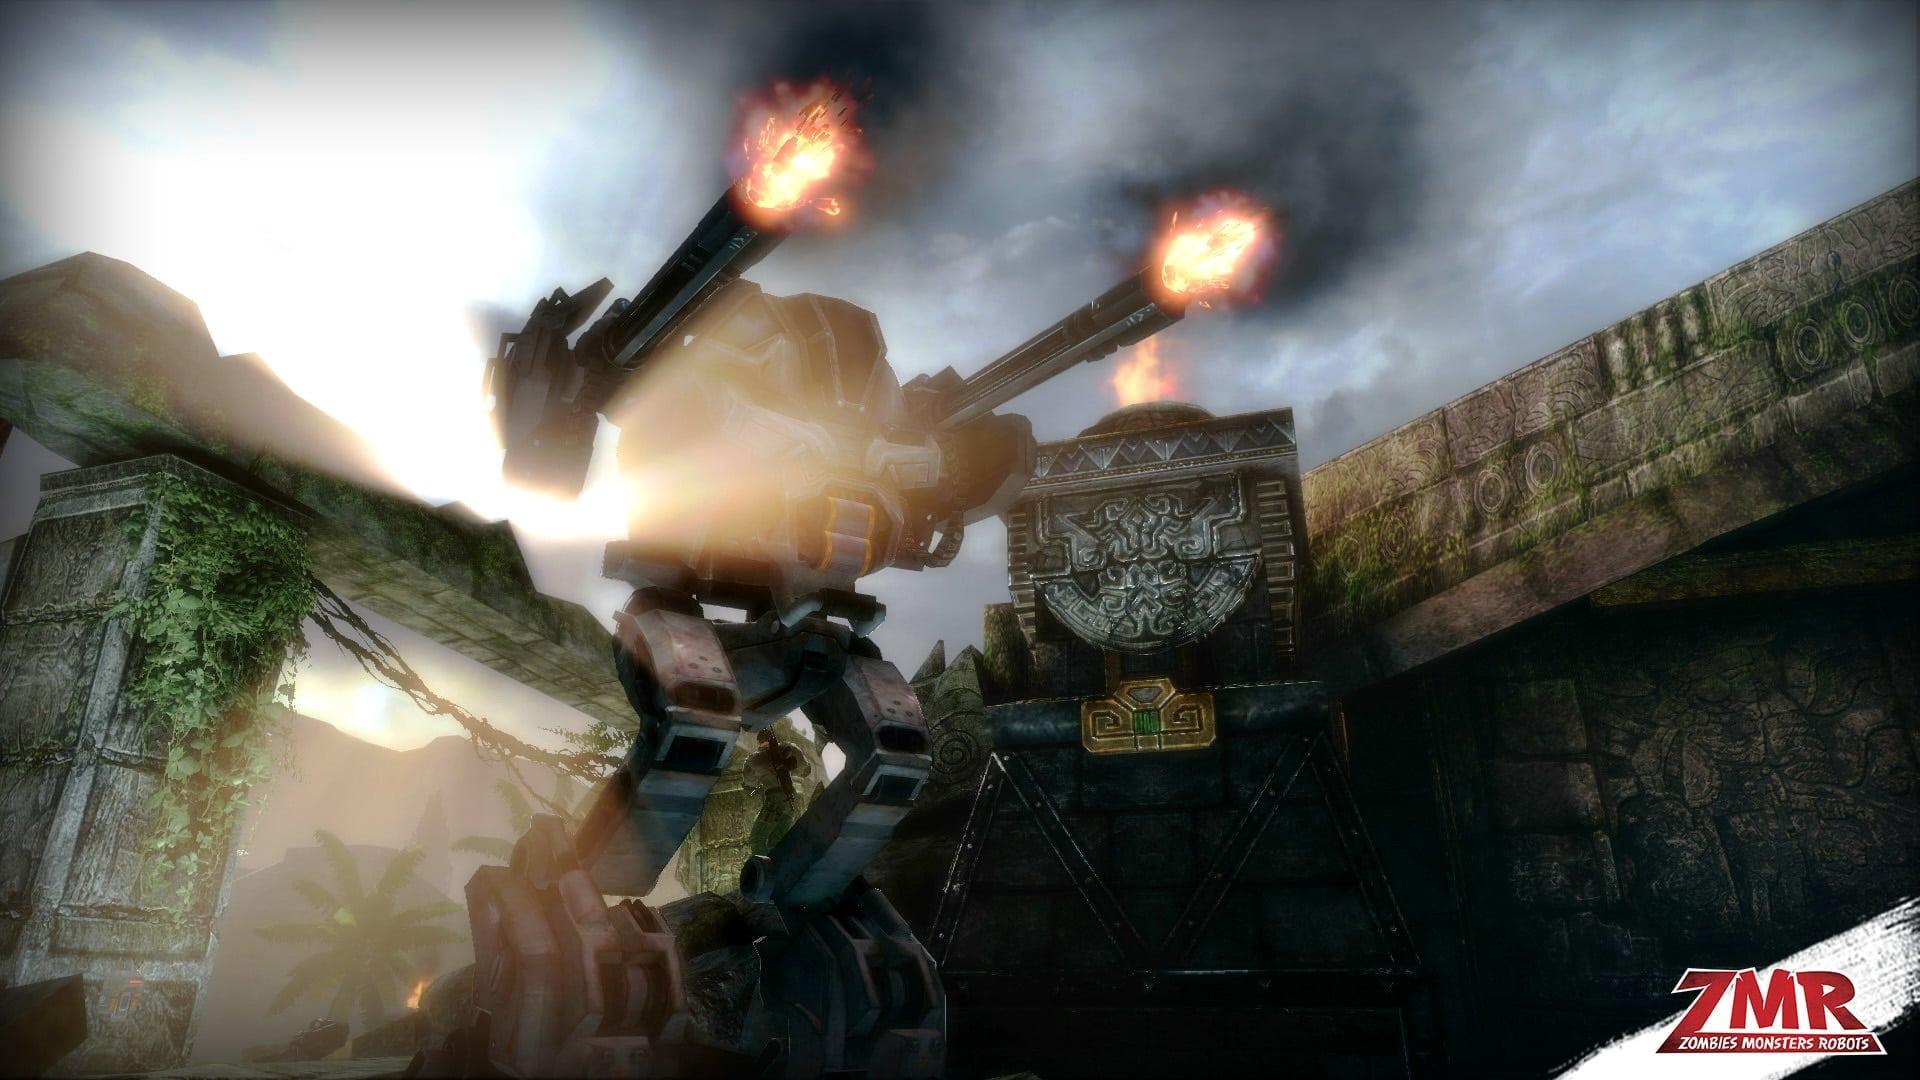 Zombies Monsters Robots - Announcement screenshot 4